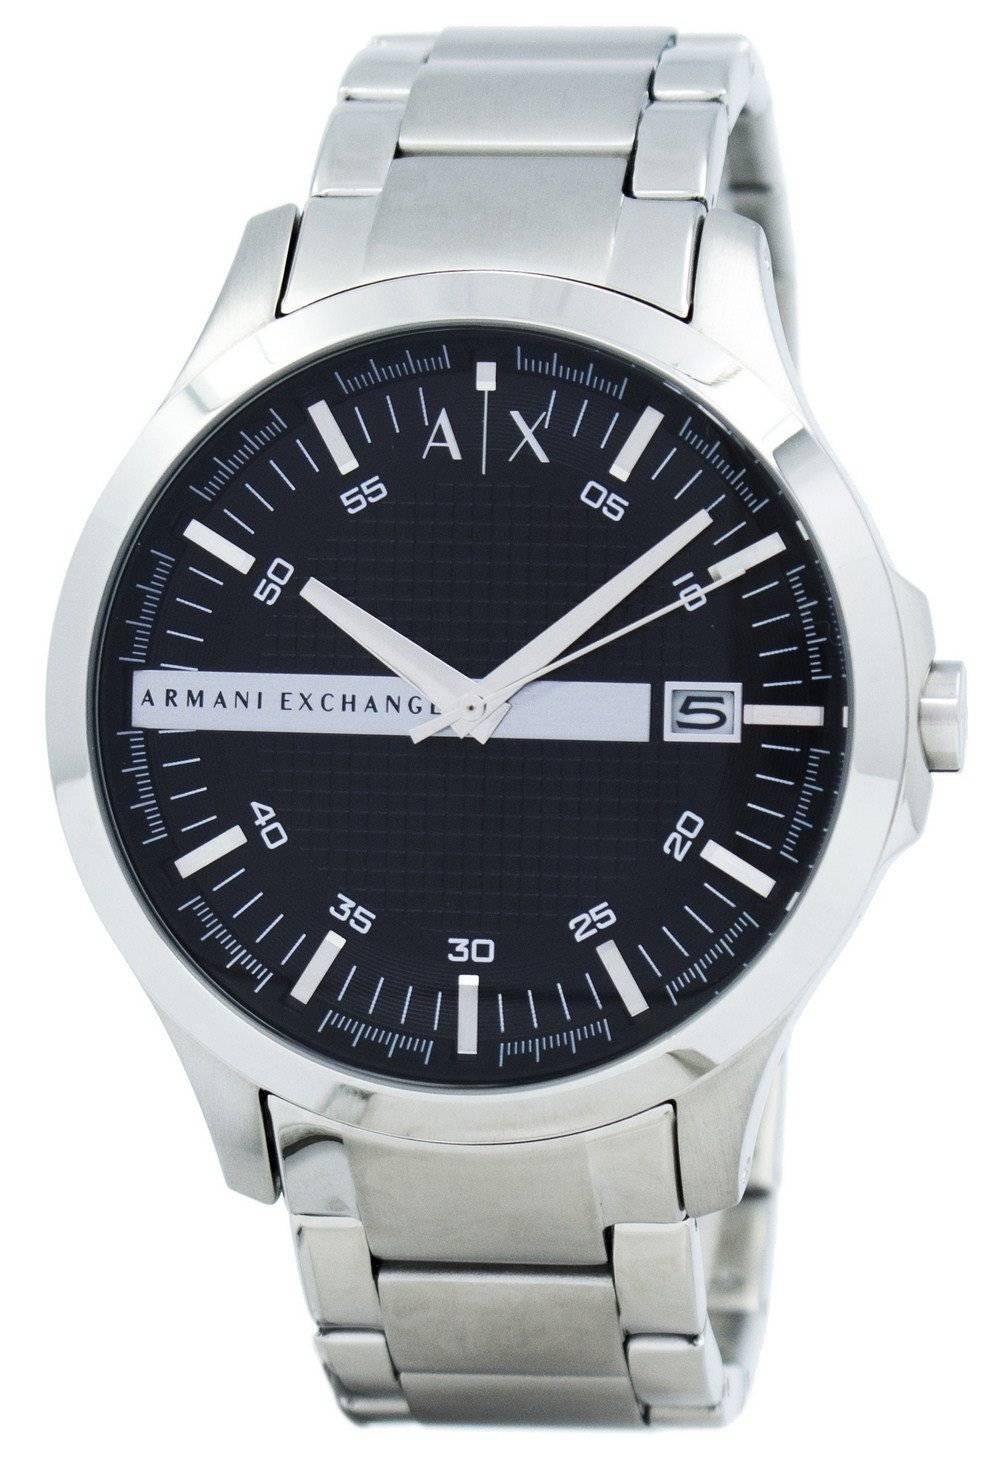 4062f278d42 Armani Exchange negro acero inoxidable AX2103 reloj de hombres